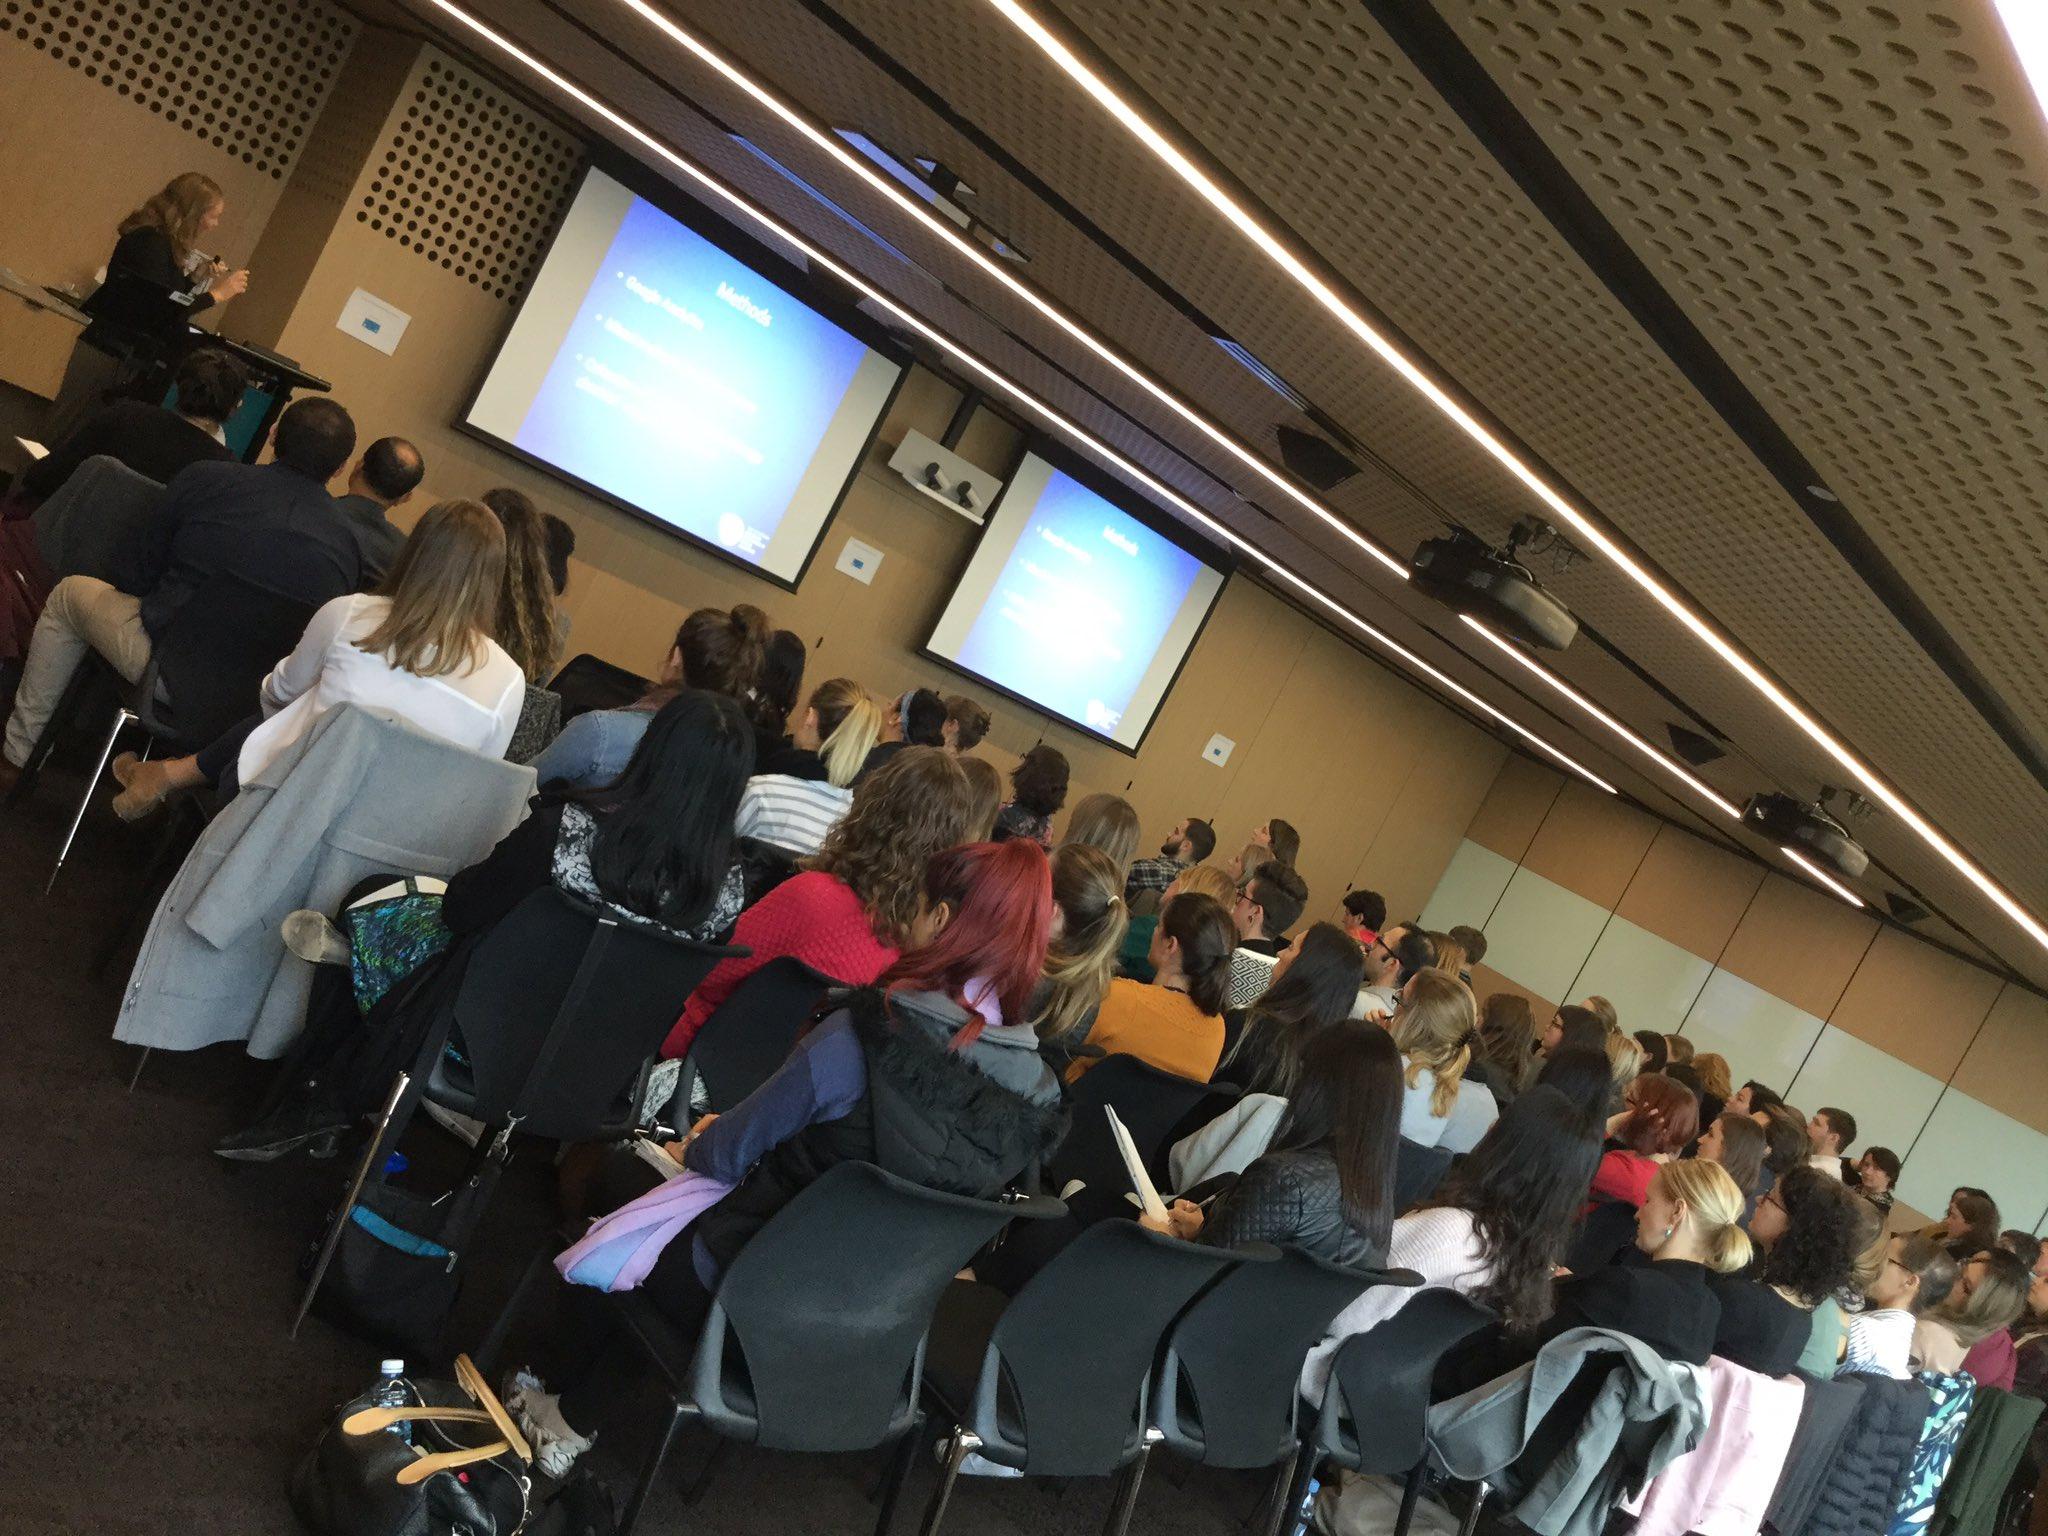 Great crowd at #mhotsymp2017 listening to amazing work done by mental health OTs @DeakinHealth @otaust @Rachel_King_1 @DanielleHitch https://t.co/DVYSUTwA8L